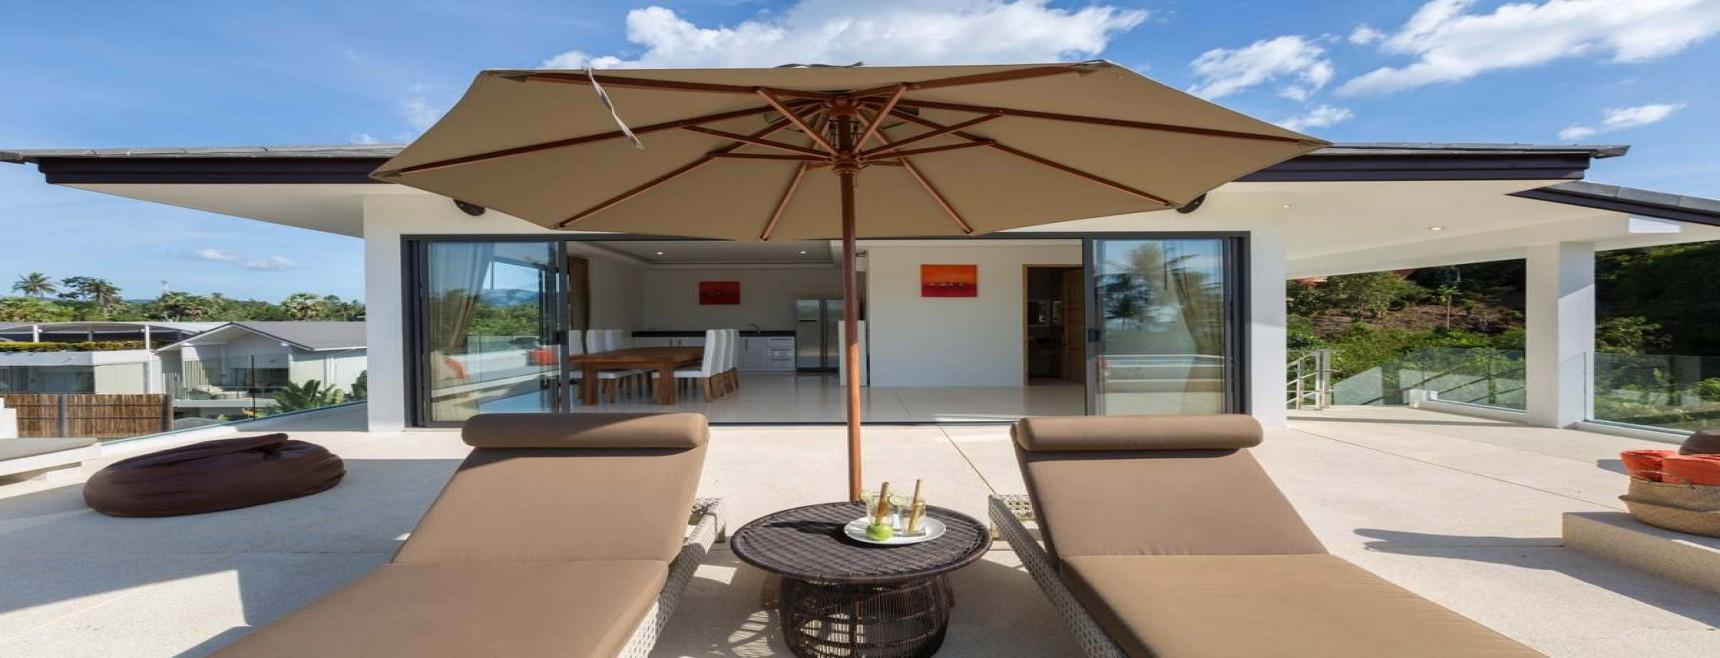 Villa, Residential Sales, Listing ID 1354, Ban Tai, North West, Koh Samui,